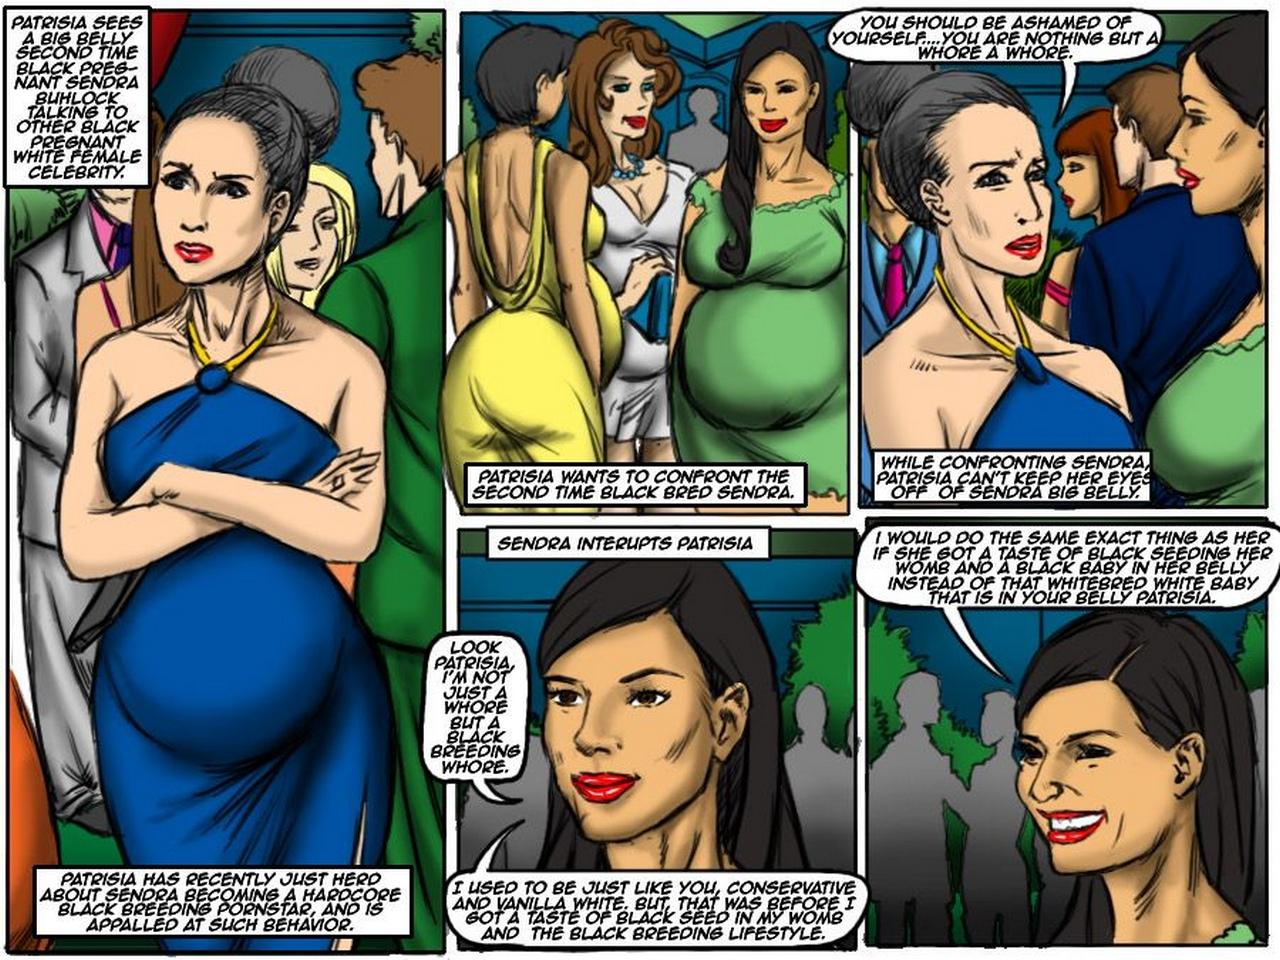 Black-Breeding-Network-3 3 free sex comic